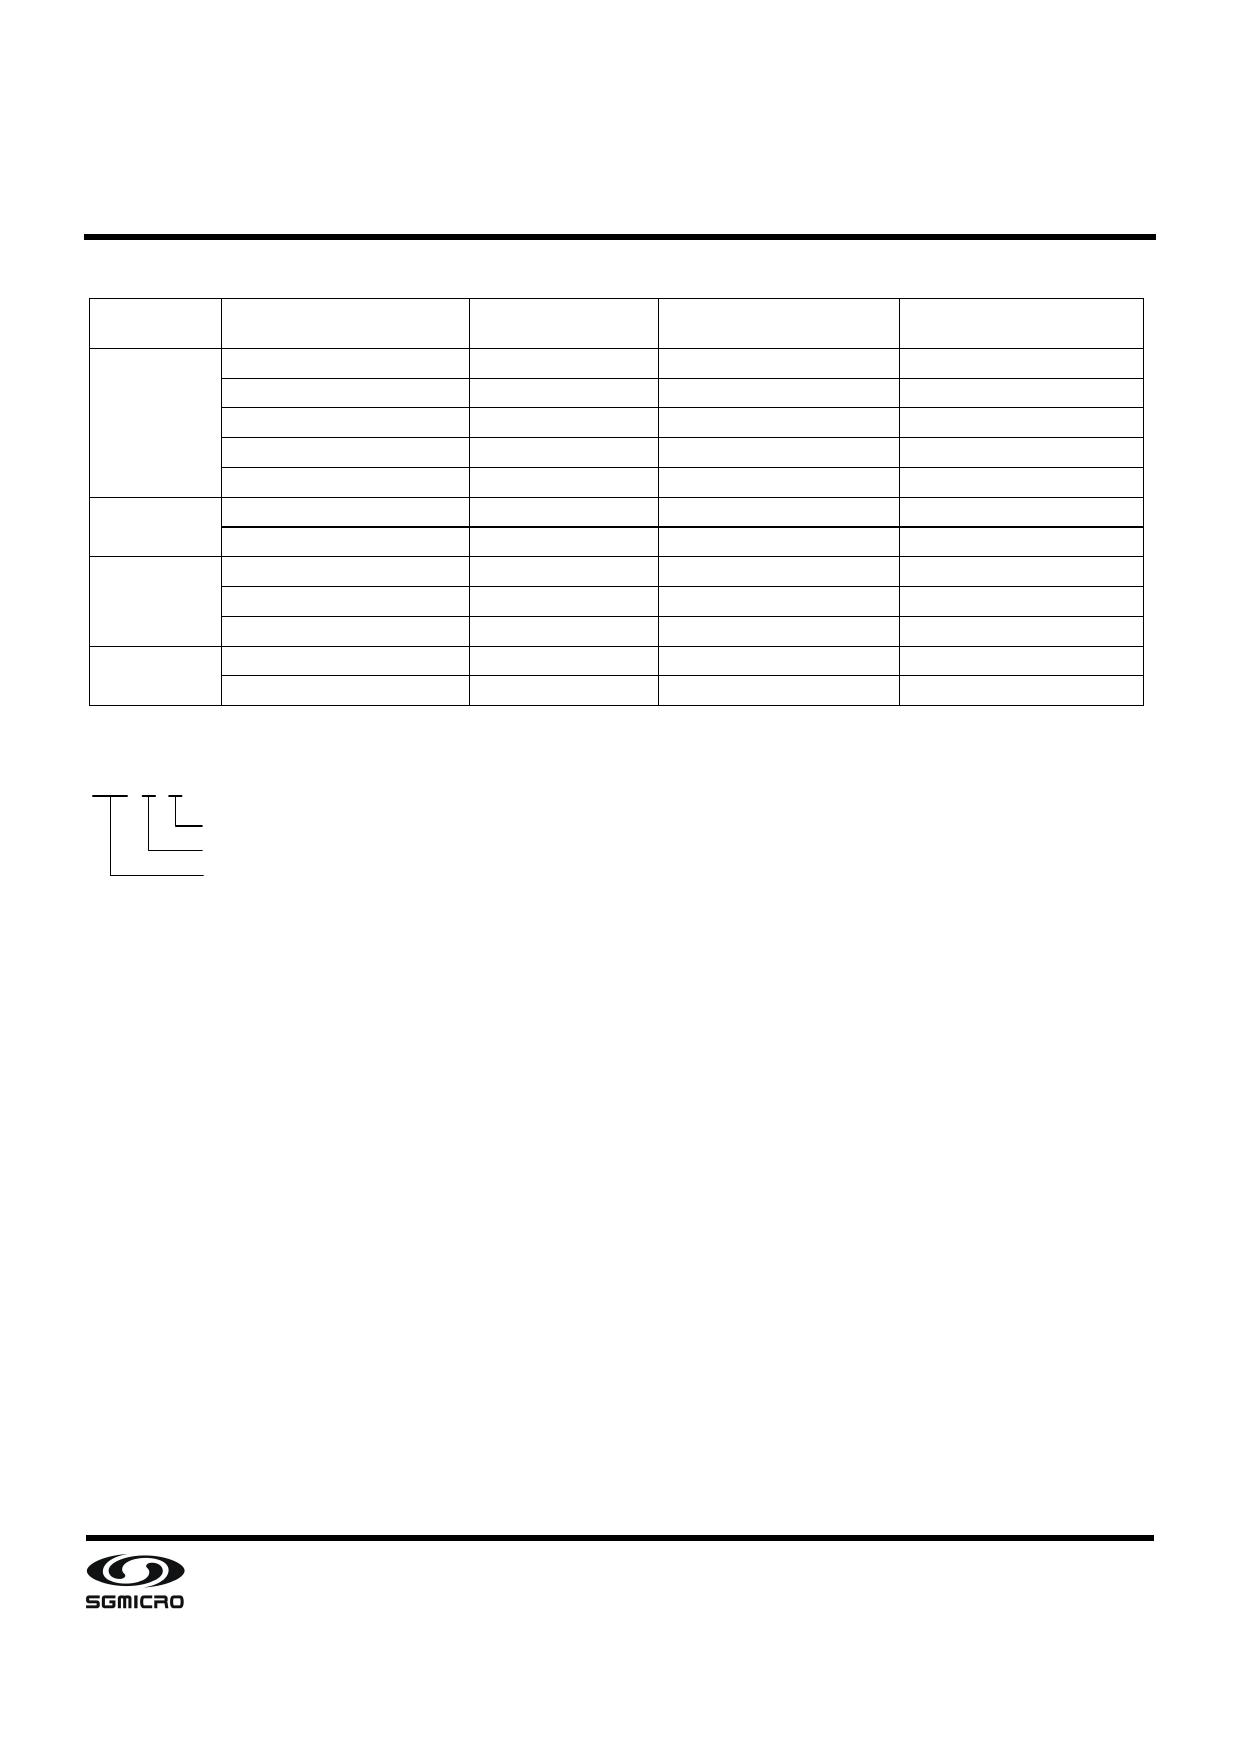 SGM8934 pdf, schematic